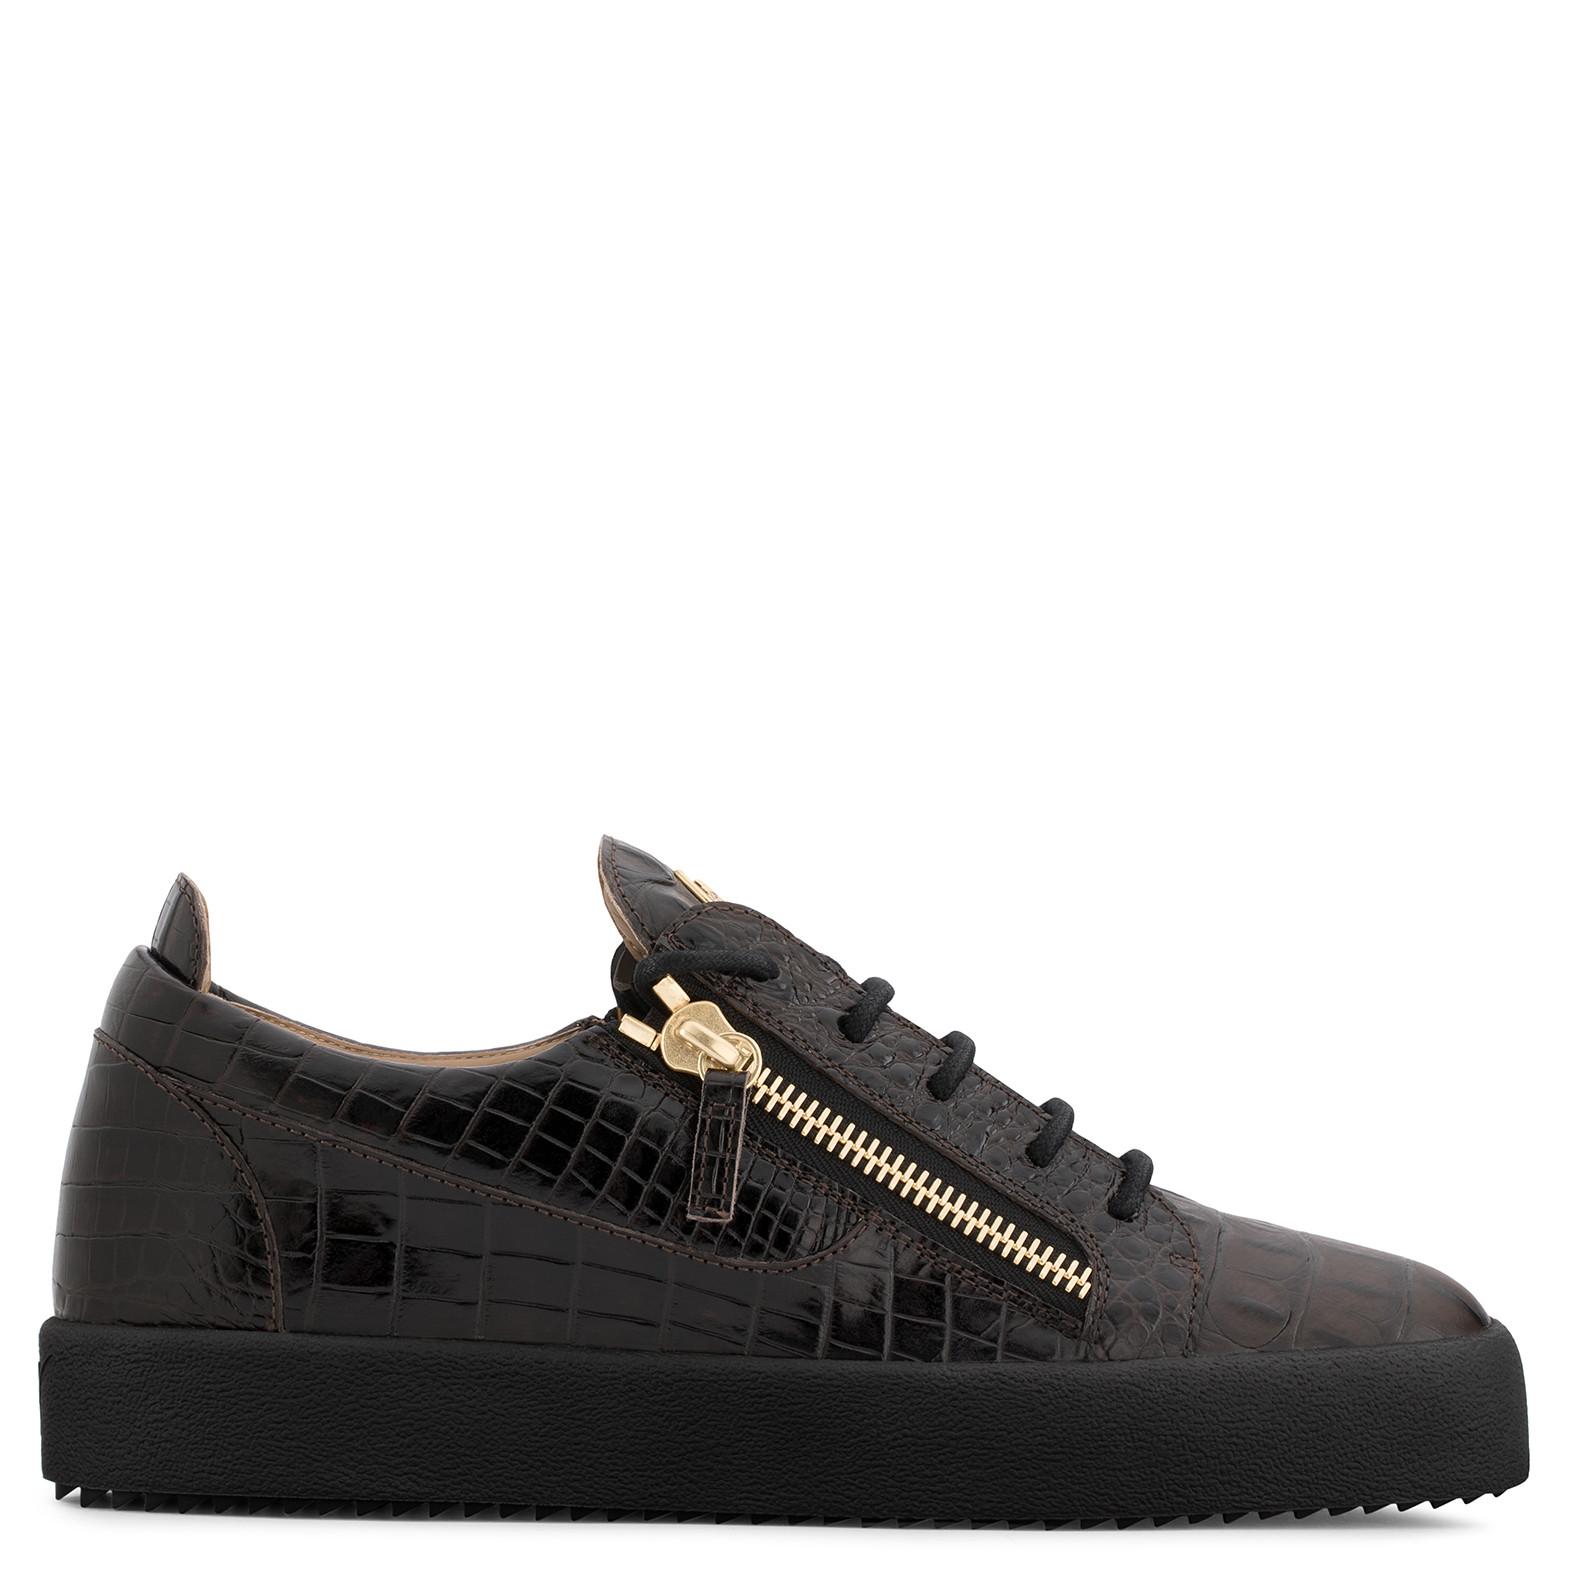 GIUSEPPE ZANOTTI - Brown Crocodile-Embossed Leather Sneaker Frankie